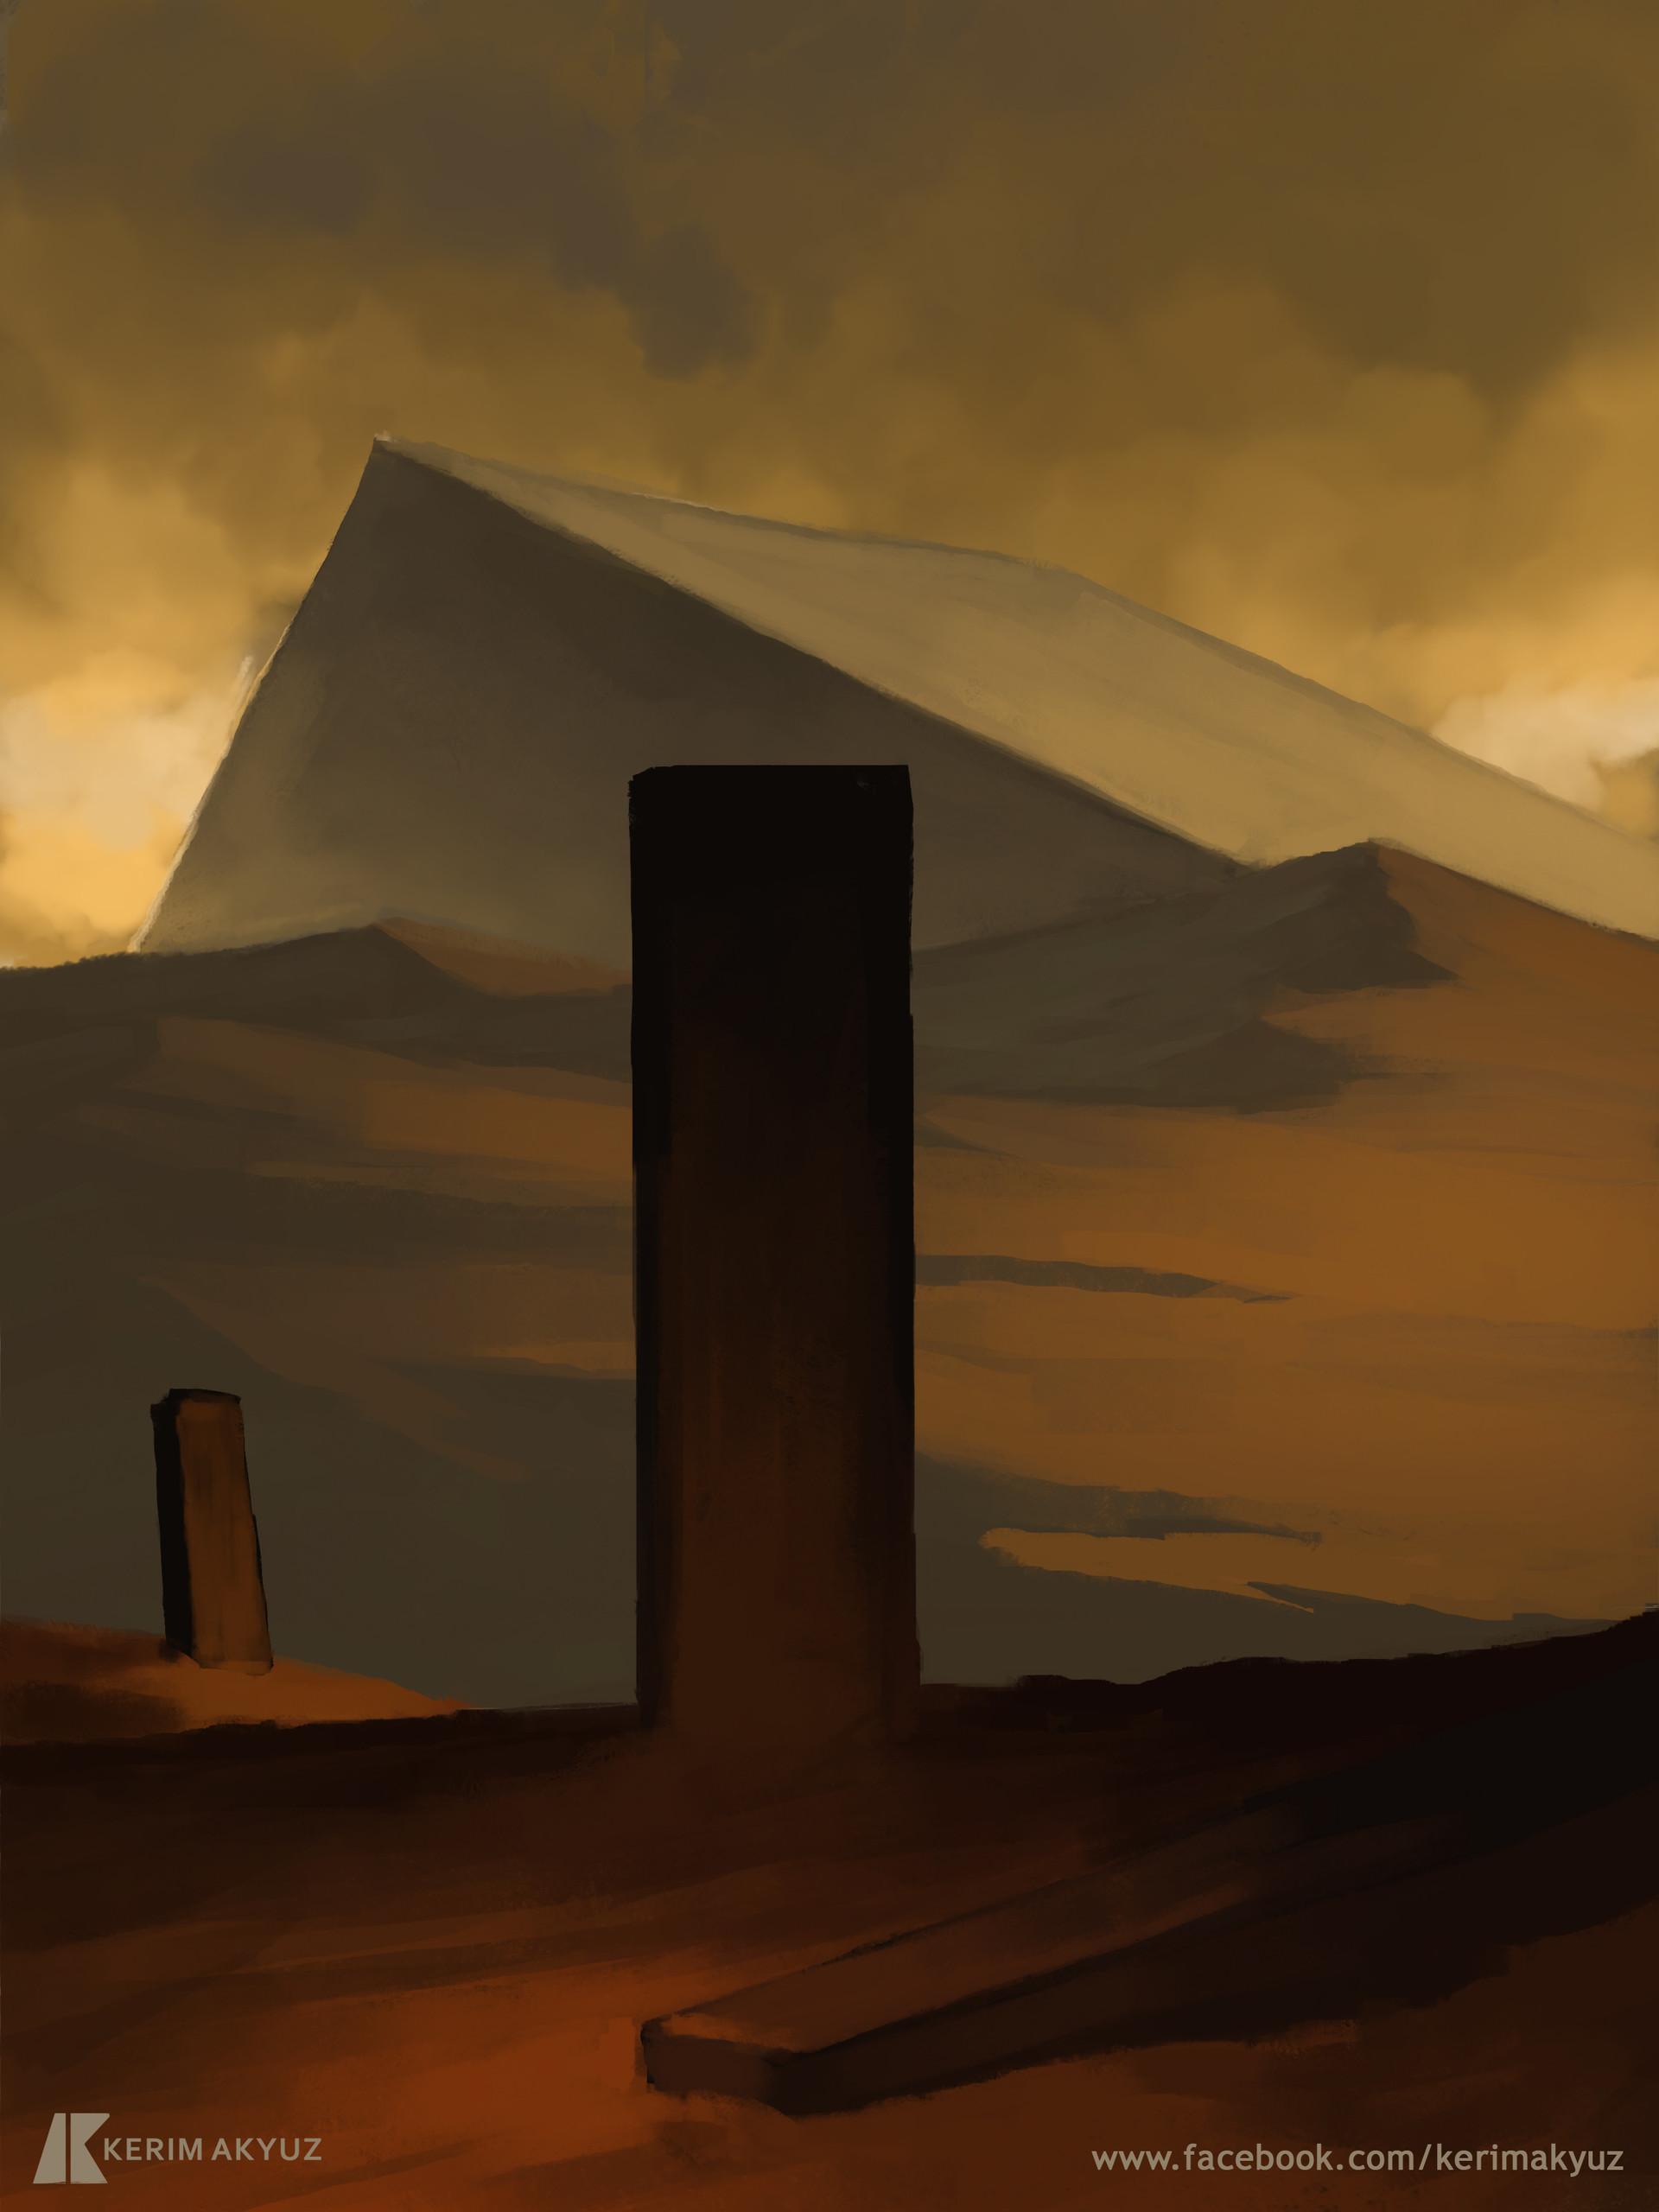 Kerim akyuz 278 monolith3